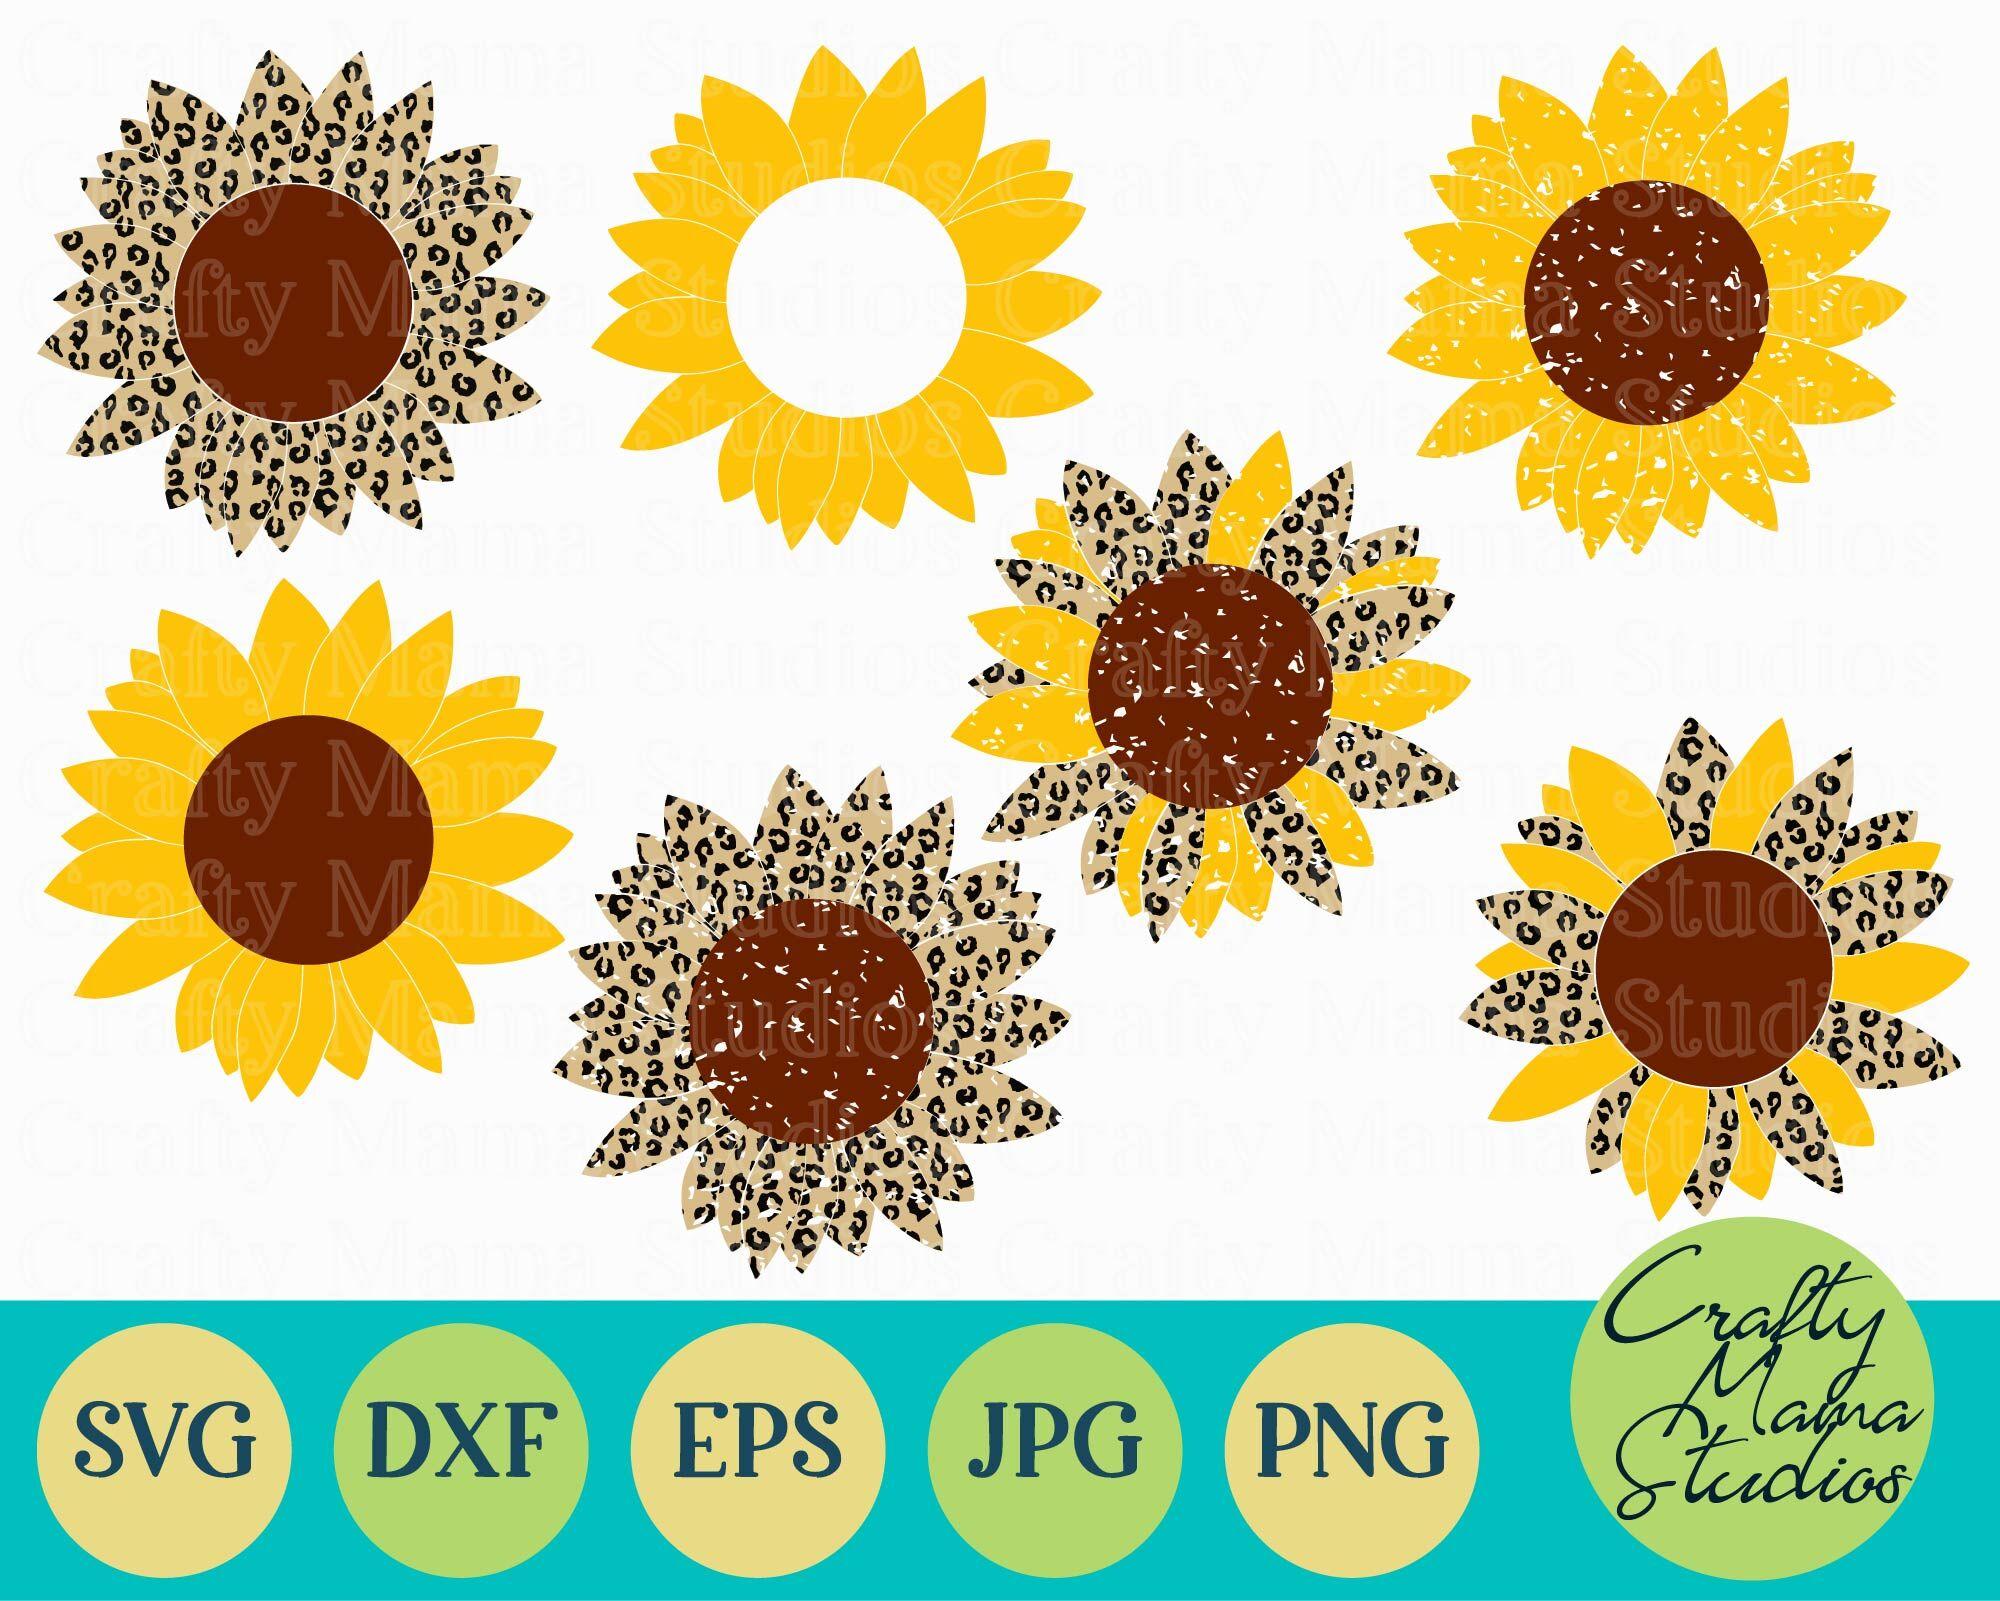 Download Sunflower Bundle Svg, Sunflower Svg, Summer Svg By Crafty ...